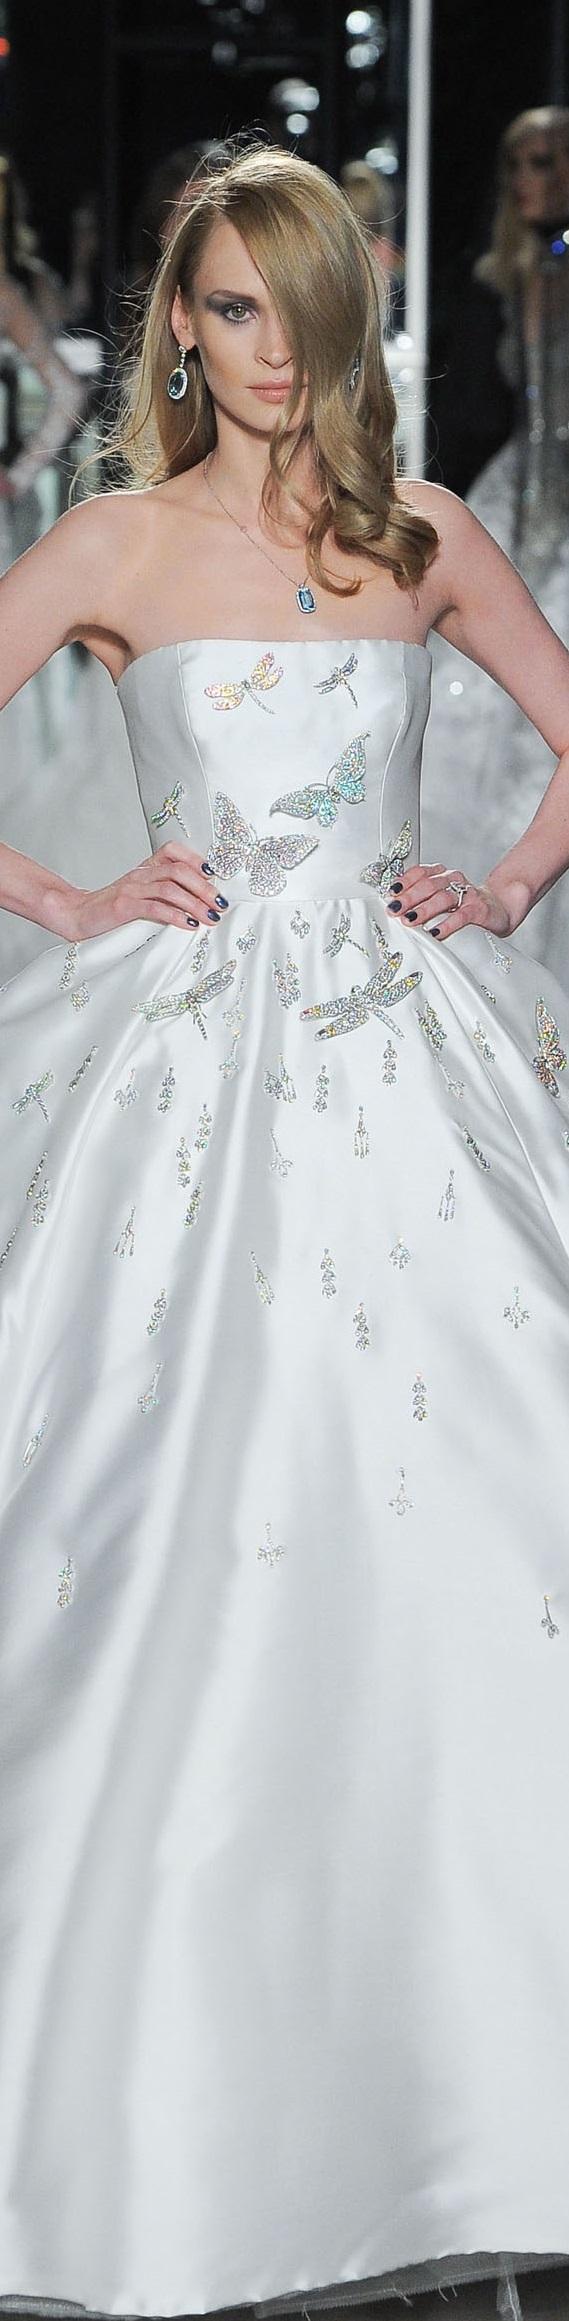 Reem acra spring bridal bridal gowns pinterest spring